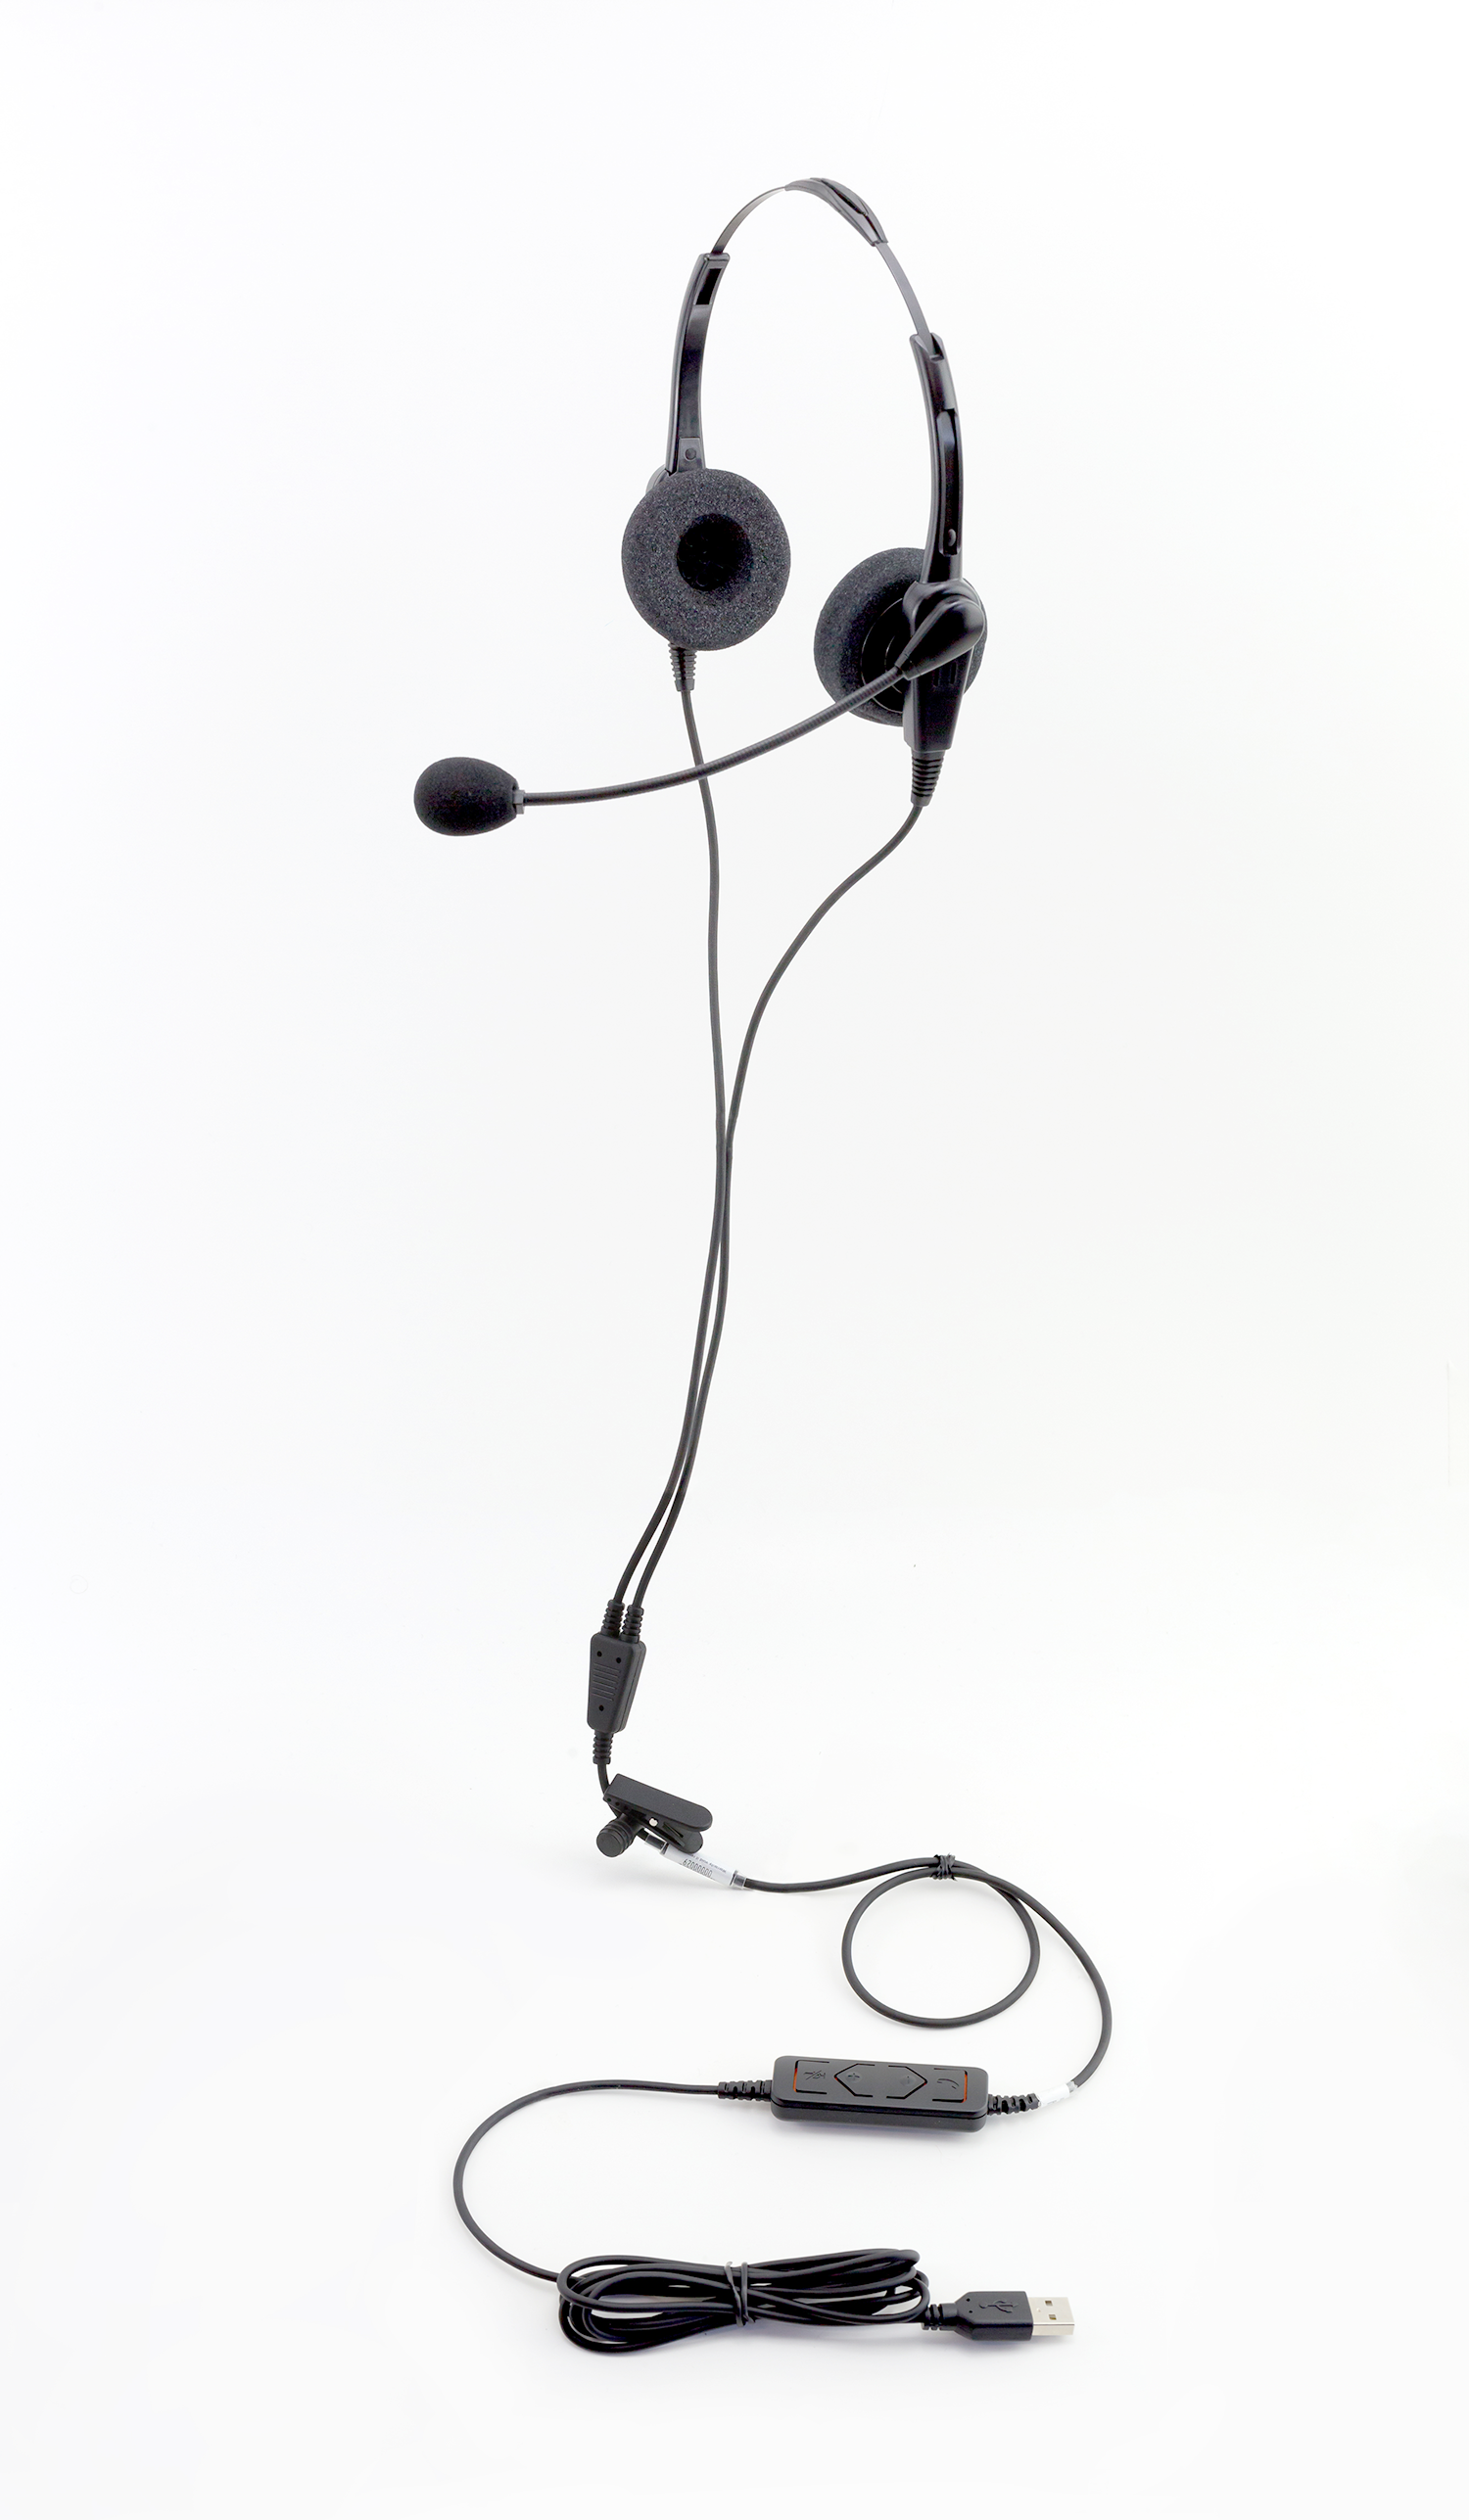 2233-Voip-Binaural-Headset